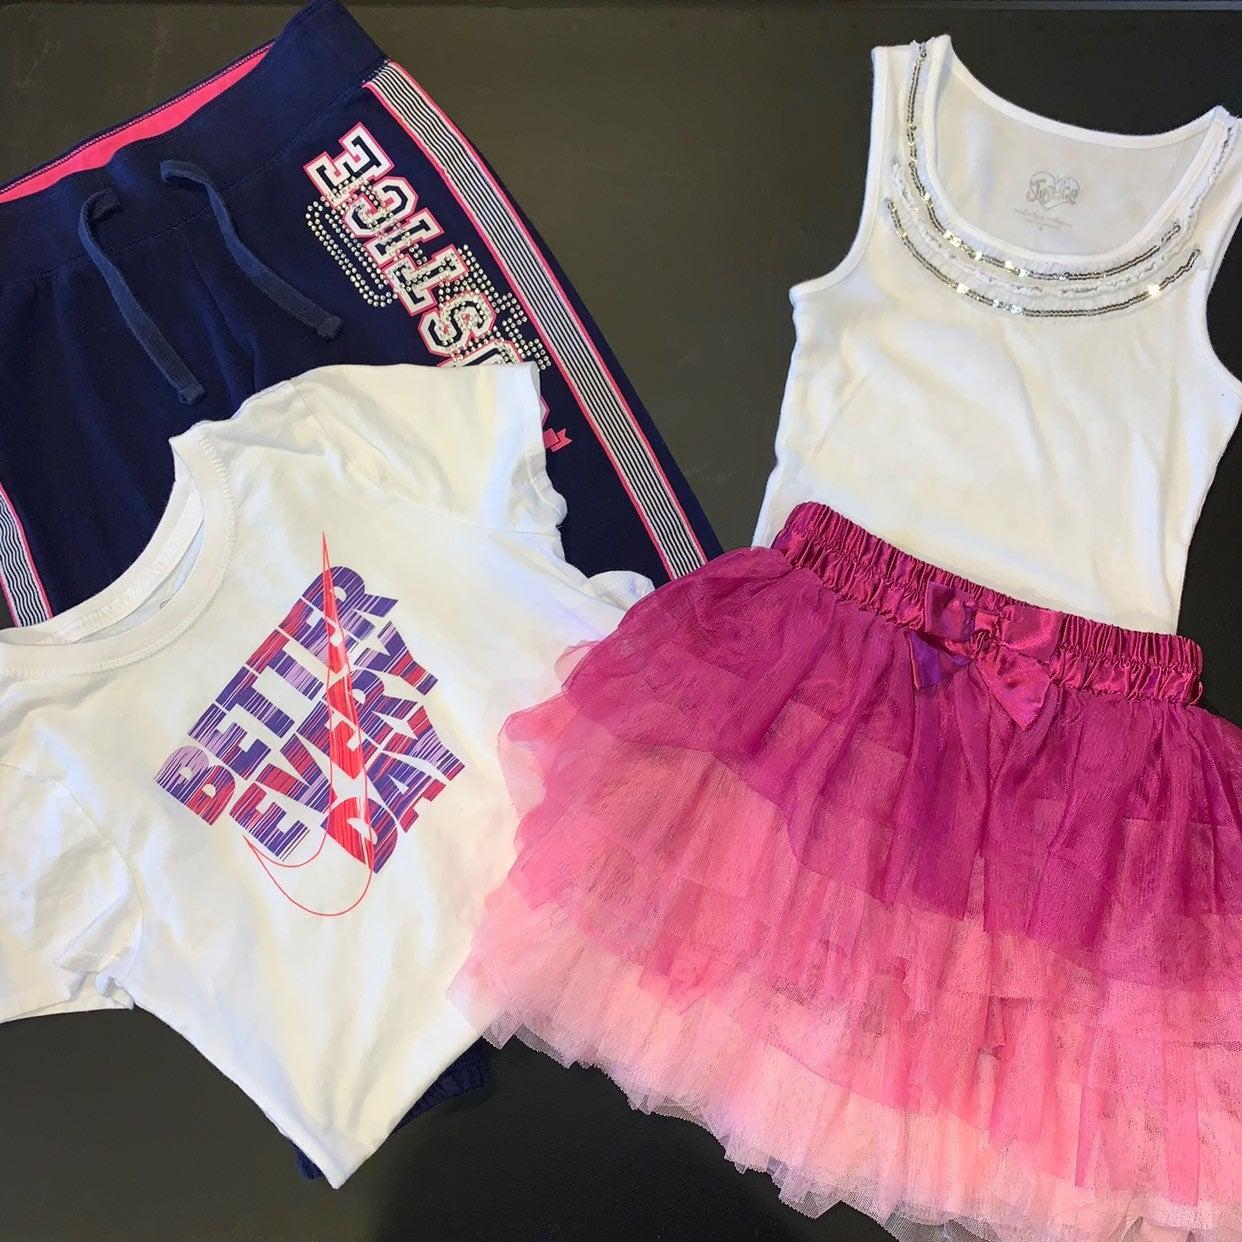 Skirt, Nike Shirt, Pants, Tank Bundle